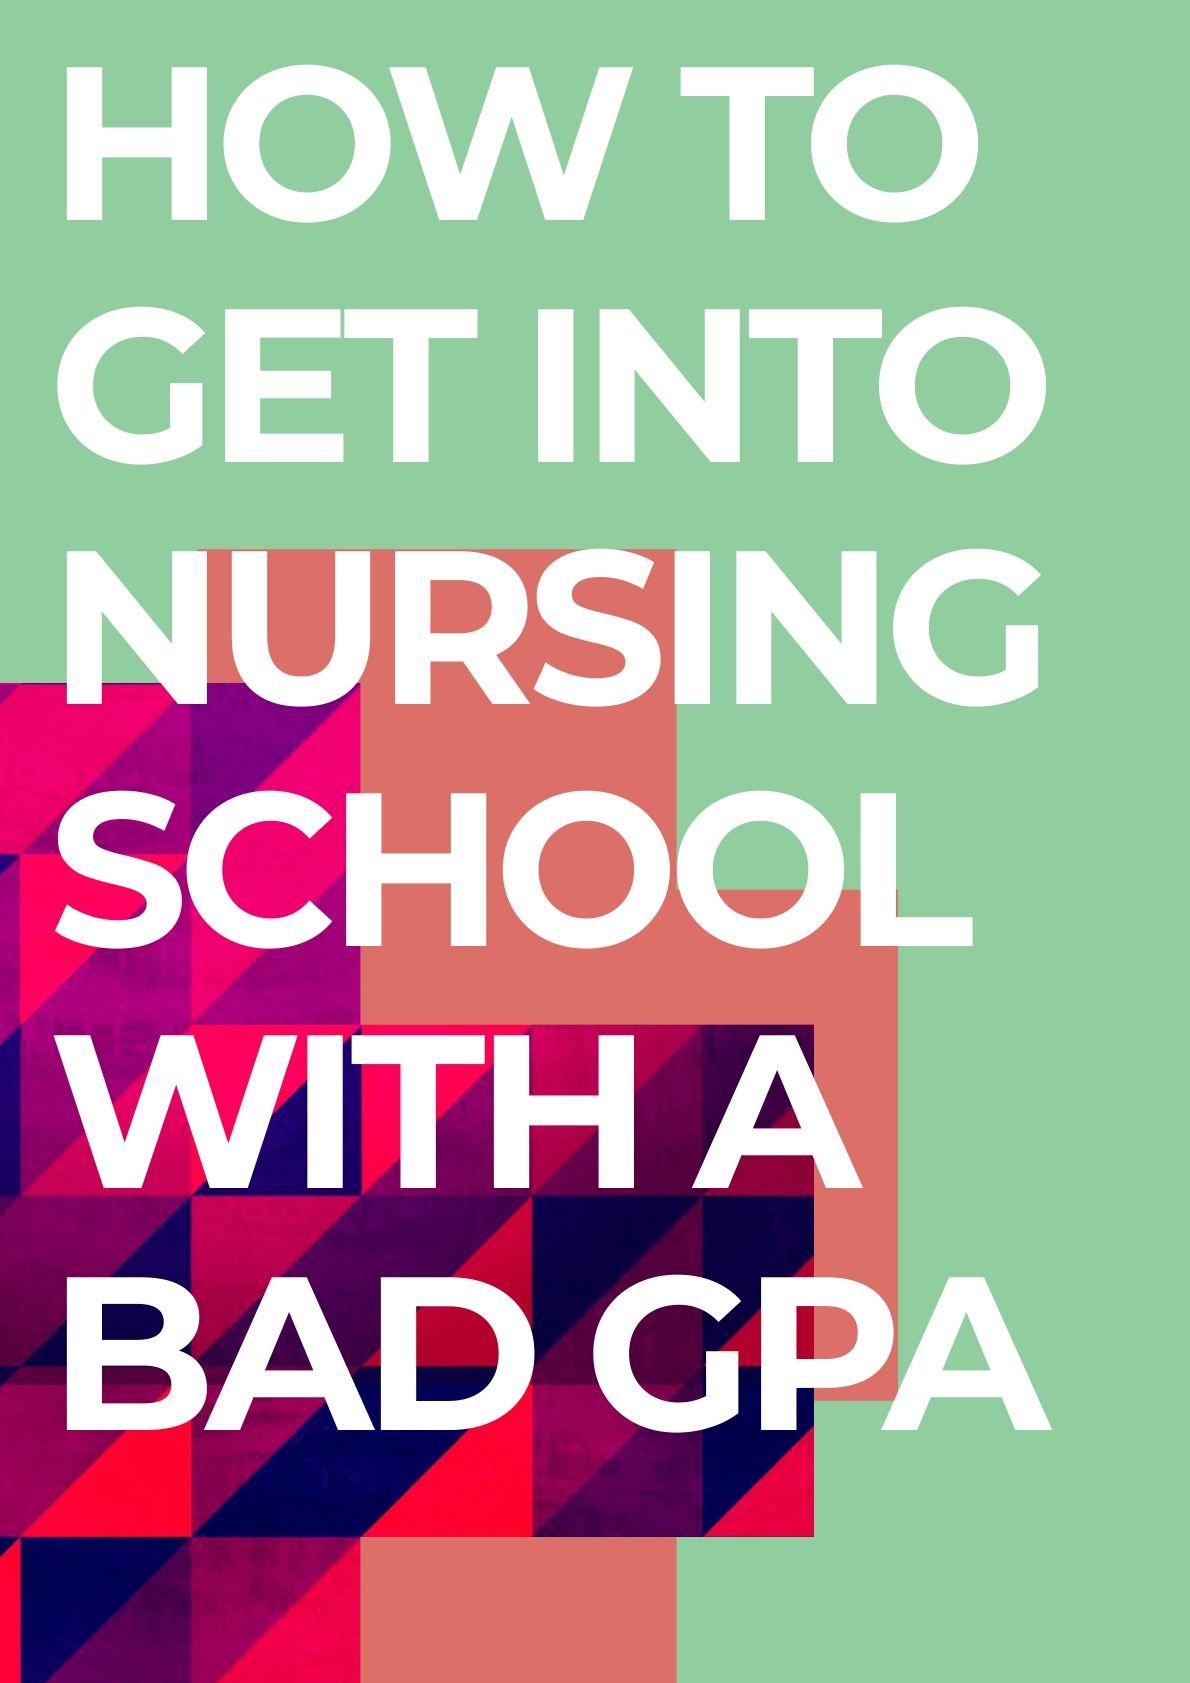 Nursing school is hard to get into but it is not always